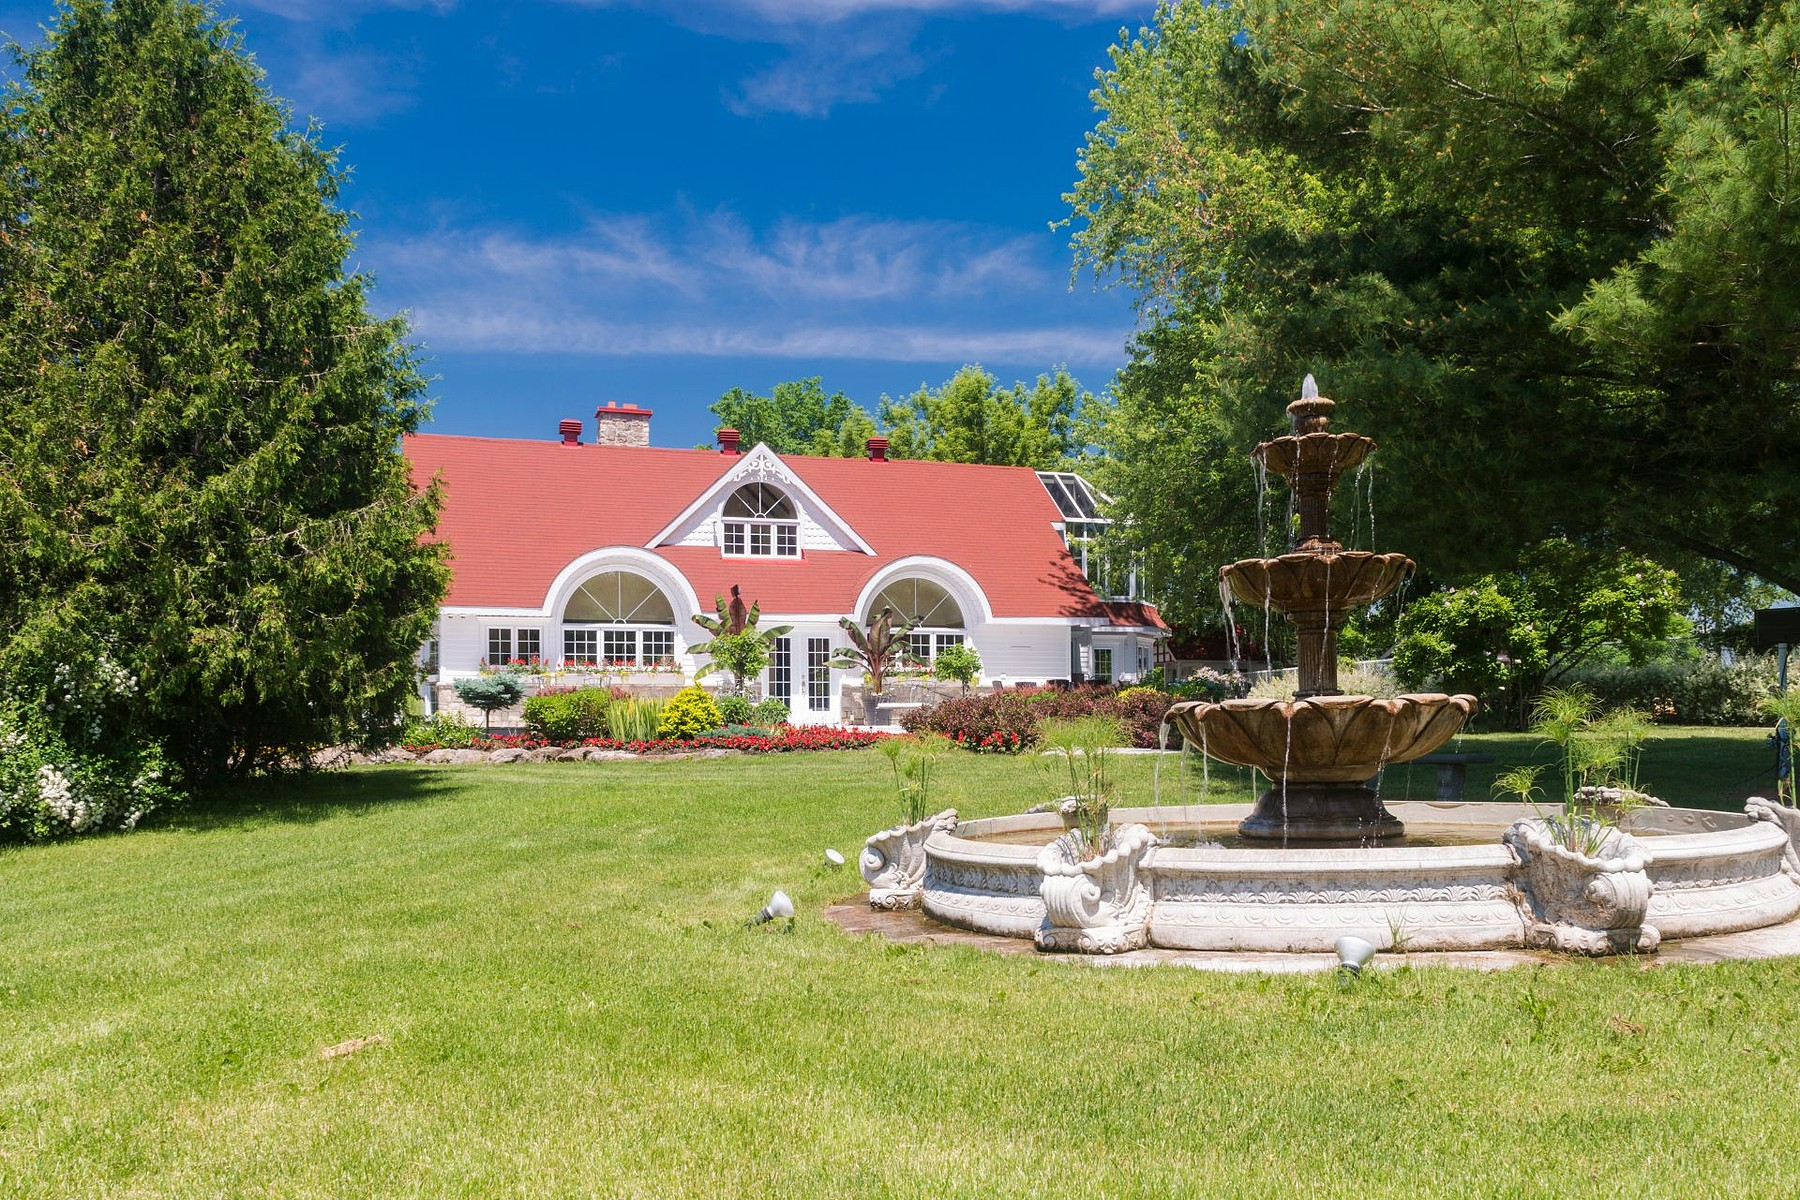 Einfamilienhaus für Verkauf beim Sainte-Clotilde-de-Châteauguay, Montérégie 959 2e Rang Sainte Clotilde, Quebec J0L1W0 Kanada